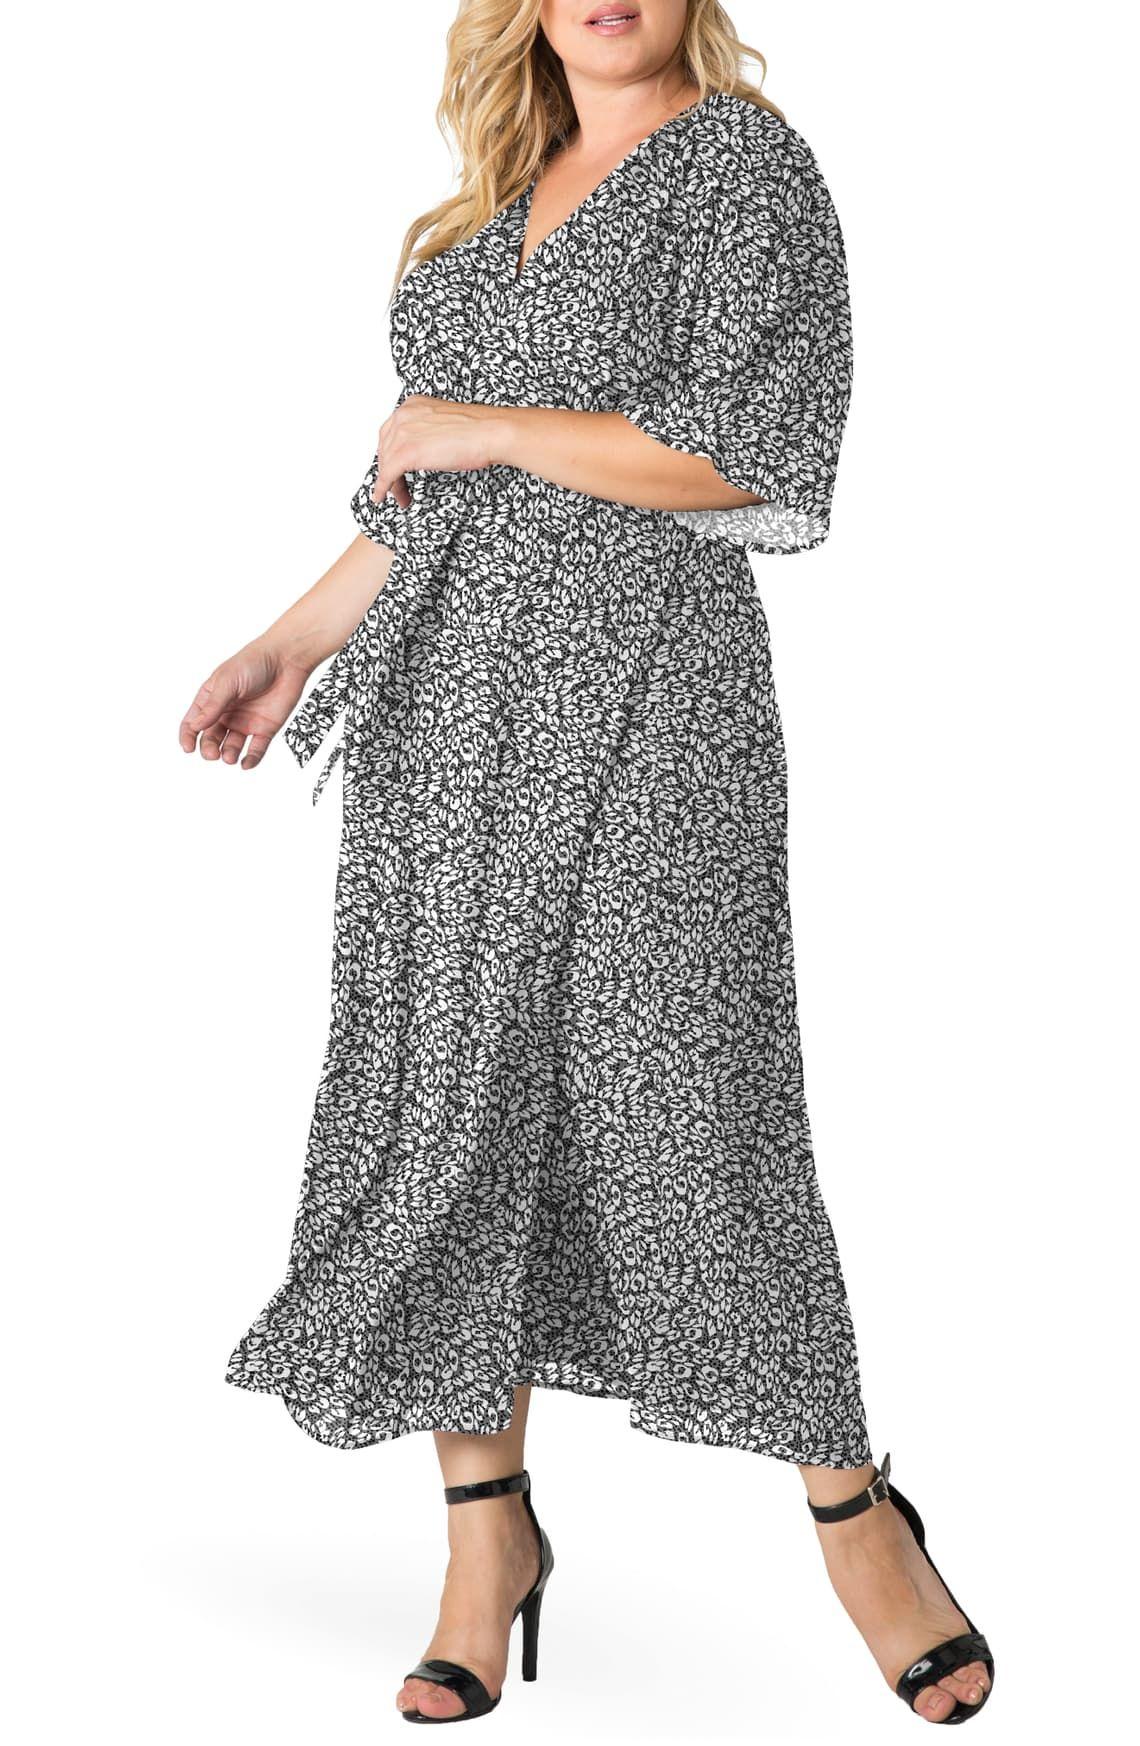 Standards Practices Short Sleeve Wrap Maxi Dress Plus Size Nordstrom Maxi Wrap Dress Maxi Dress Plus Size Maxi Dresses [ 1746 x 1140 Pixel ]